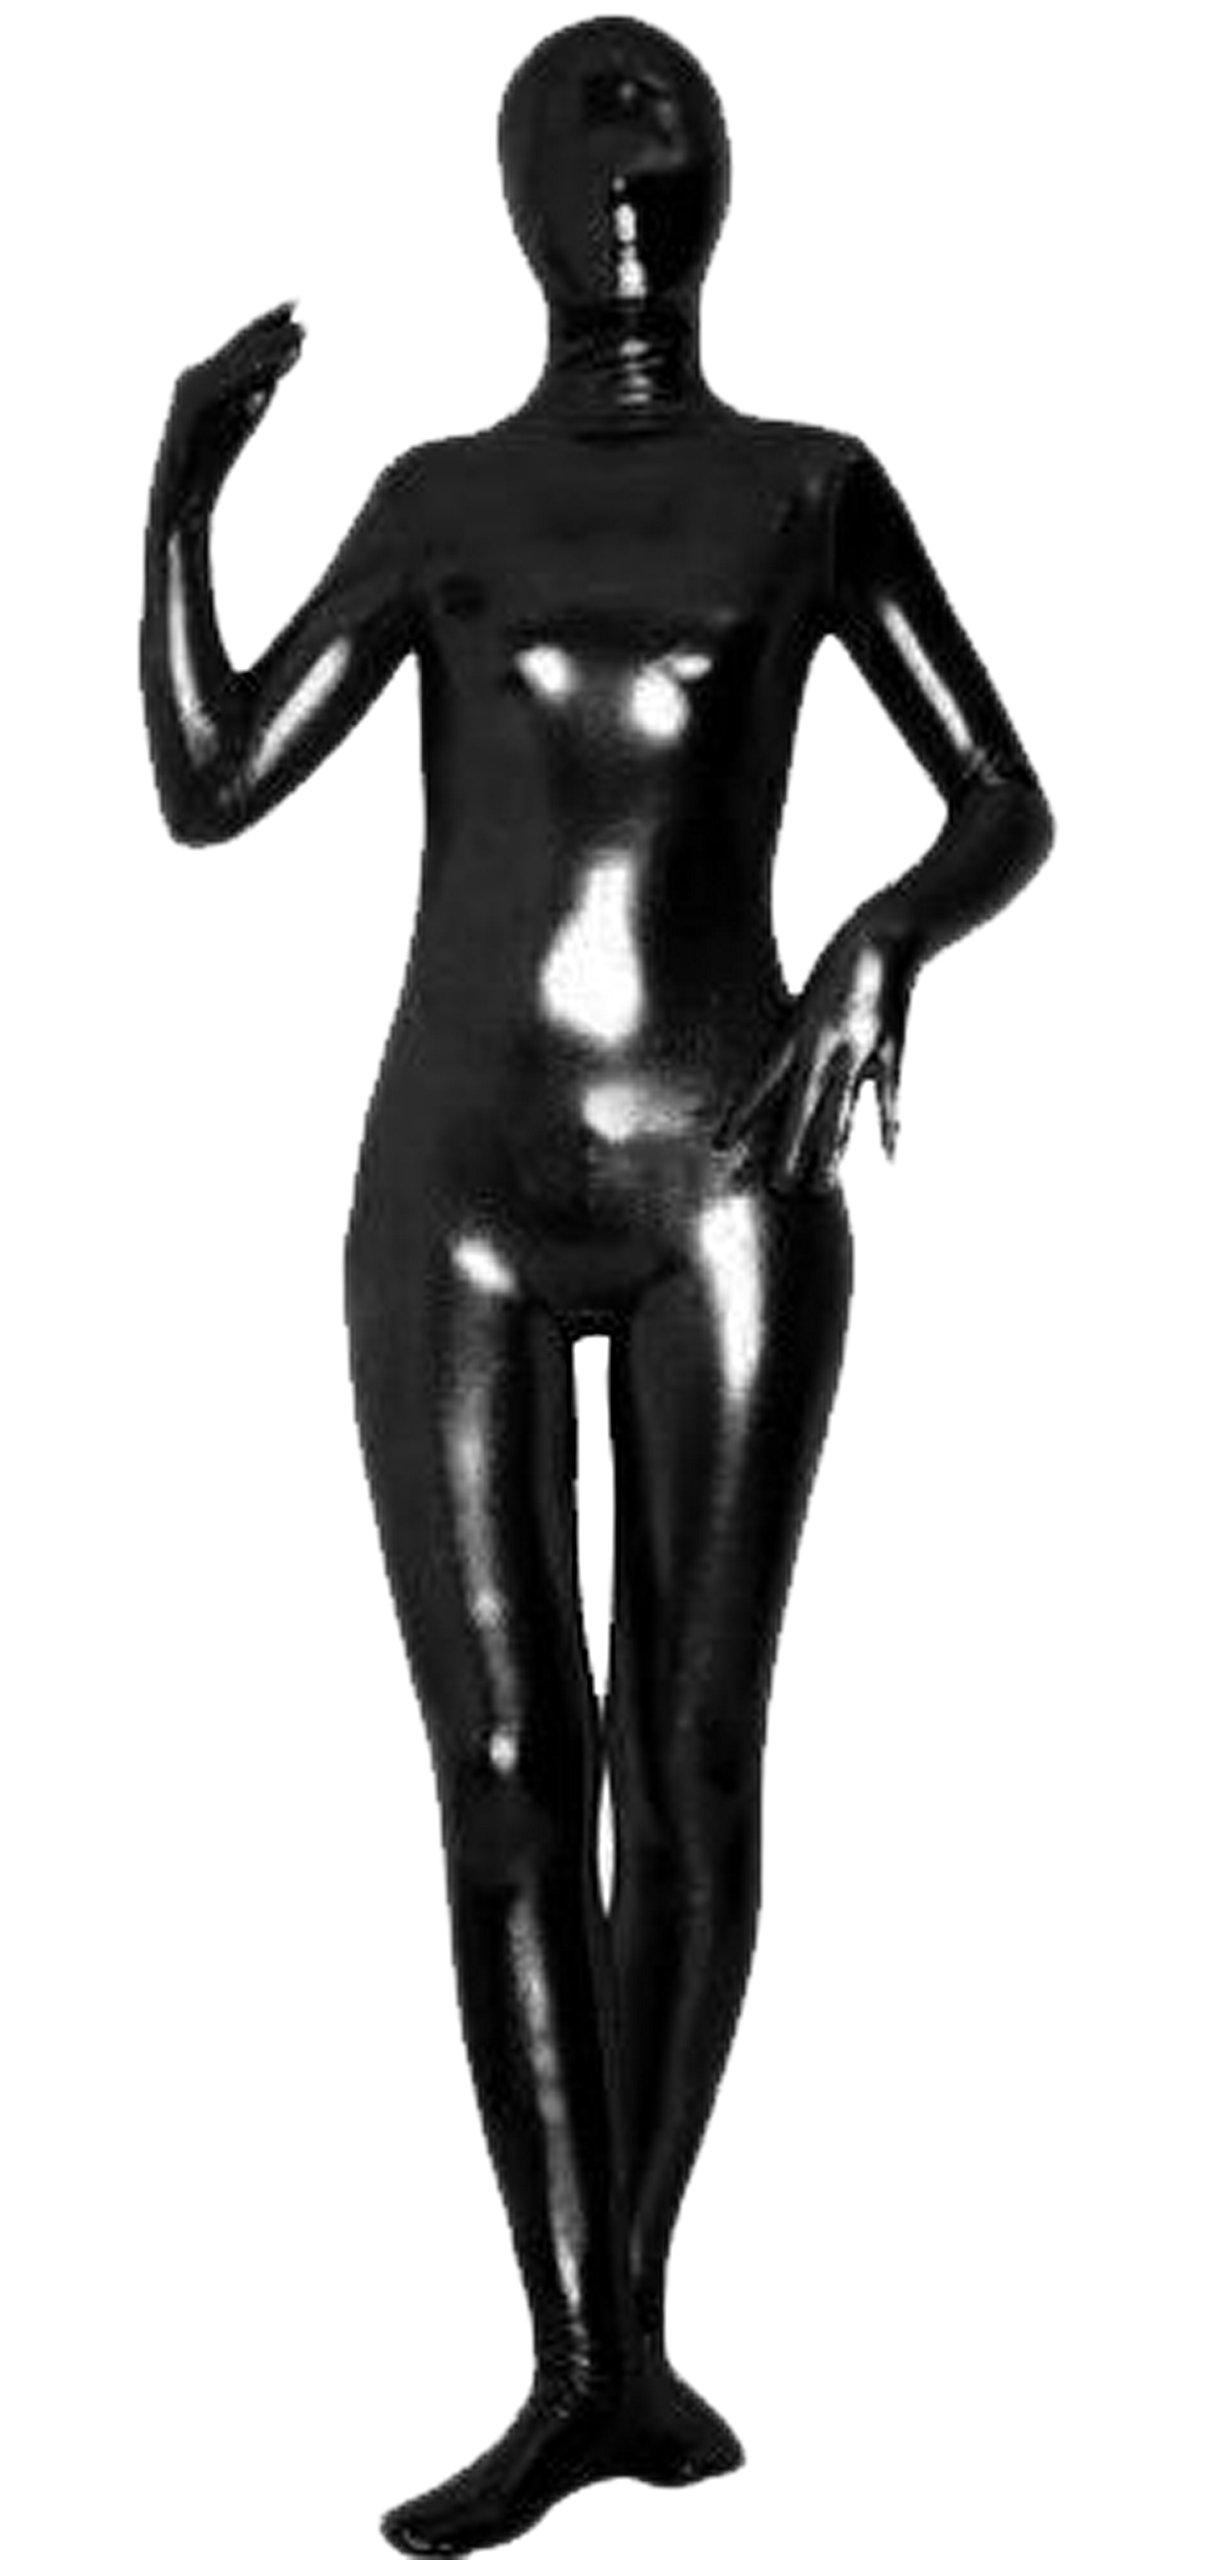 - 71uNmAJpn 2BL - VSVO Unisex Baby Shiny Spandex Skin-tight Full Bodysuit Zentai Costume